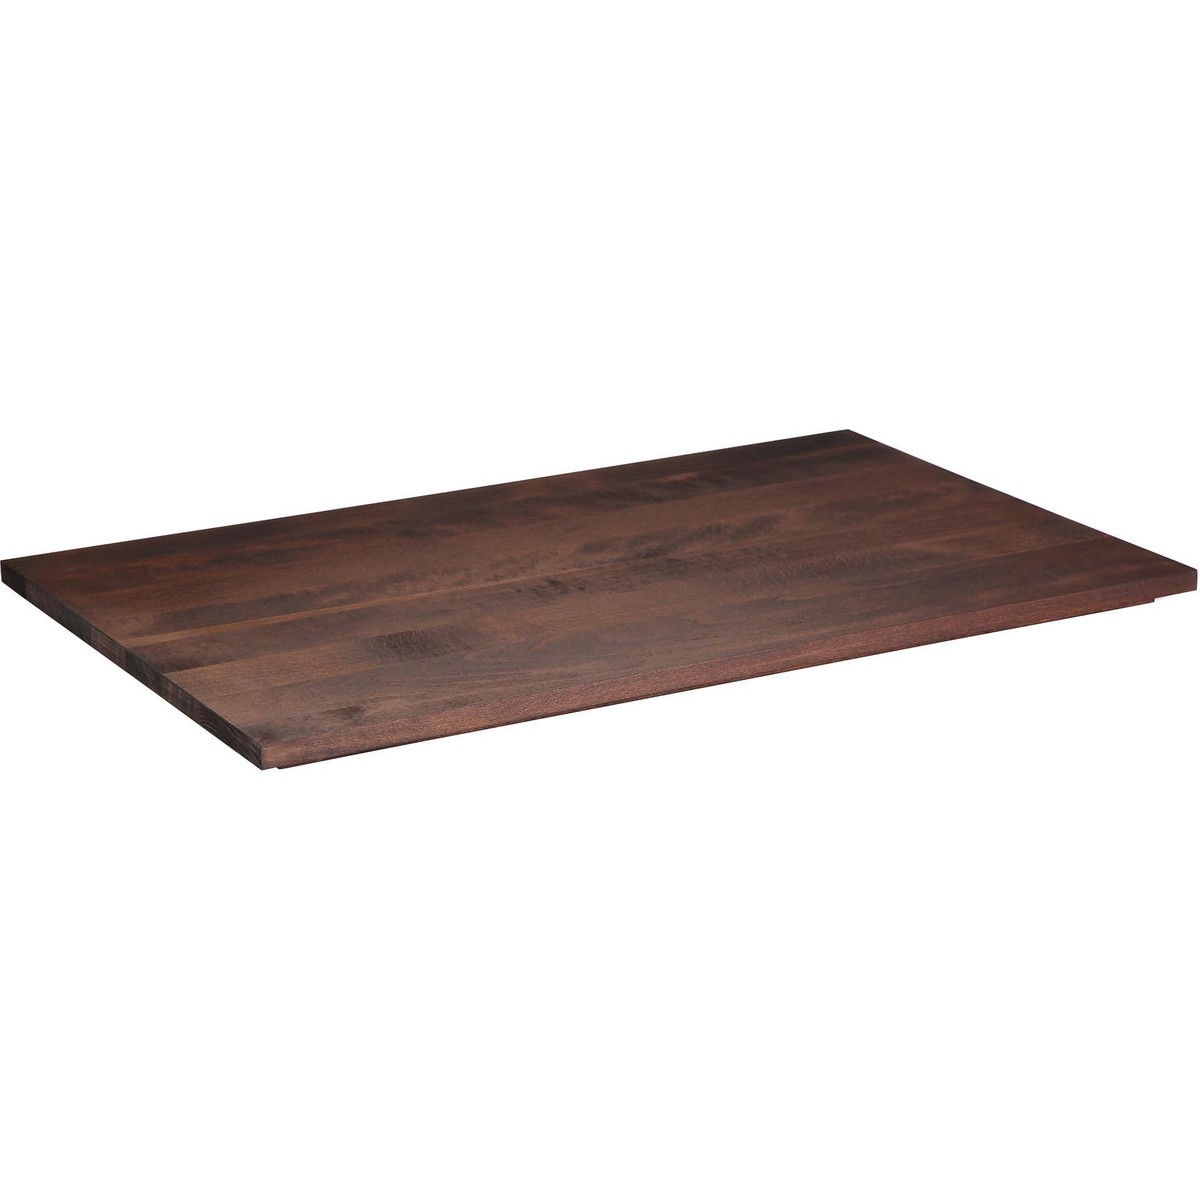 Aufsatz 1/1 GN Buche dunkel Platte